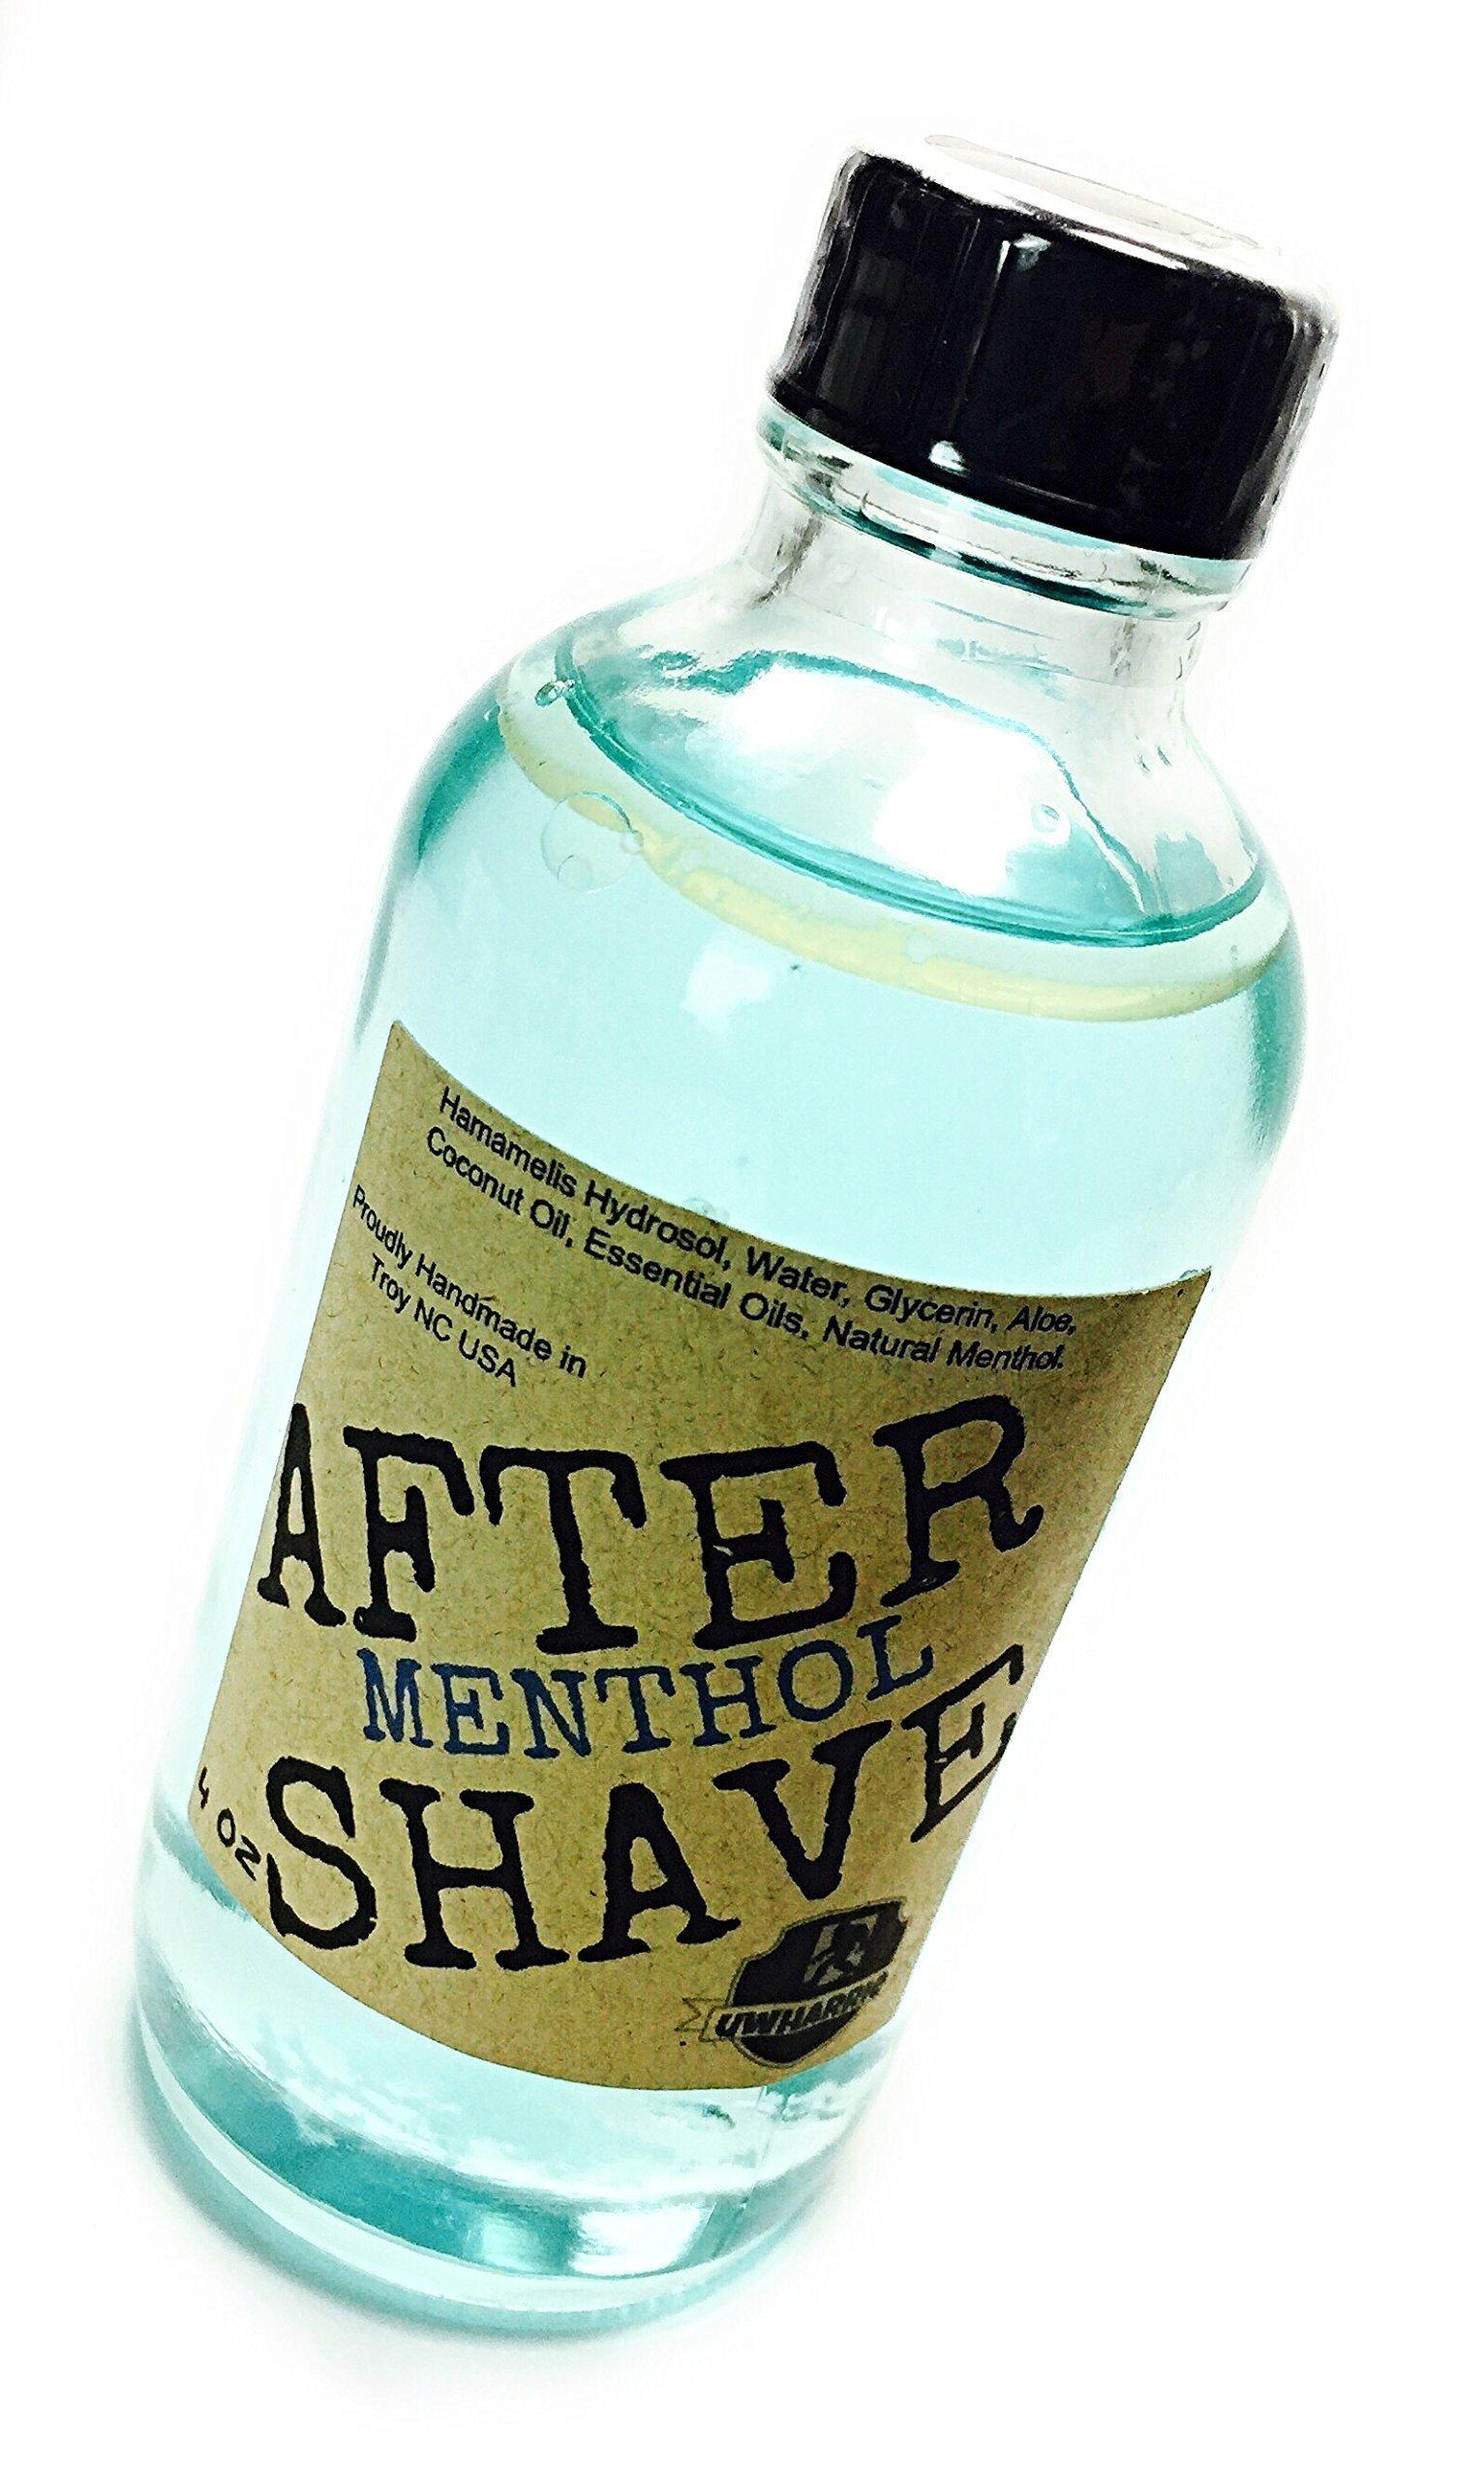 Uwharrie Soap Co. Retro Menthol Essential Oil Aftershave Splash, Prohibition Era Barber Shop Natural AFTERSHAVE 4oz.